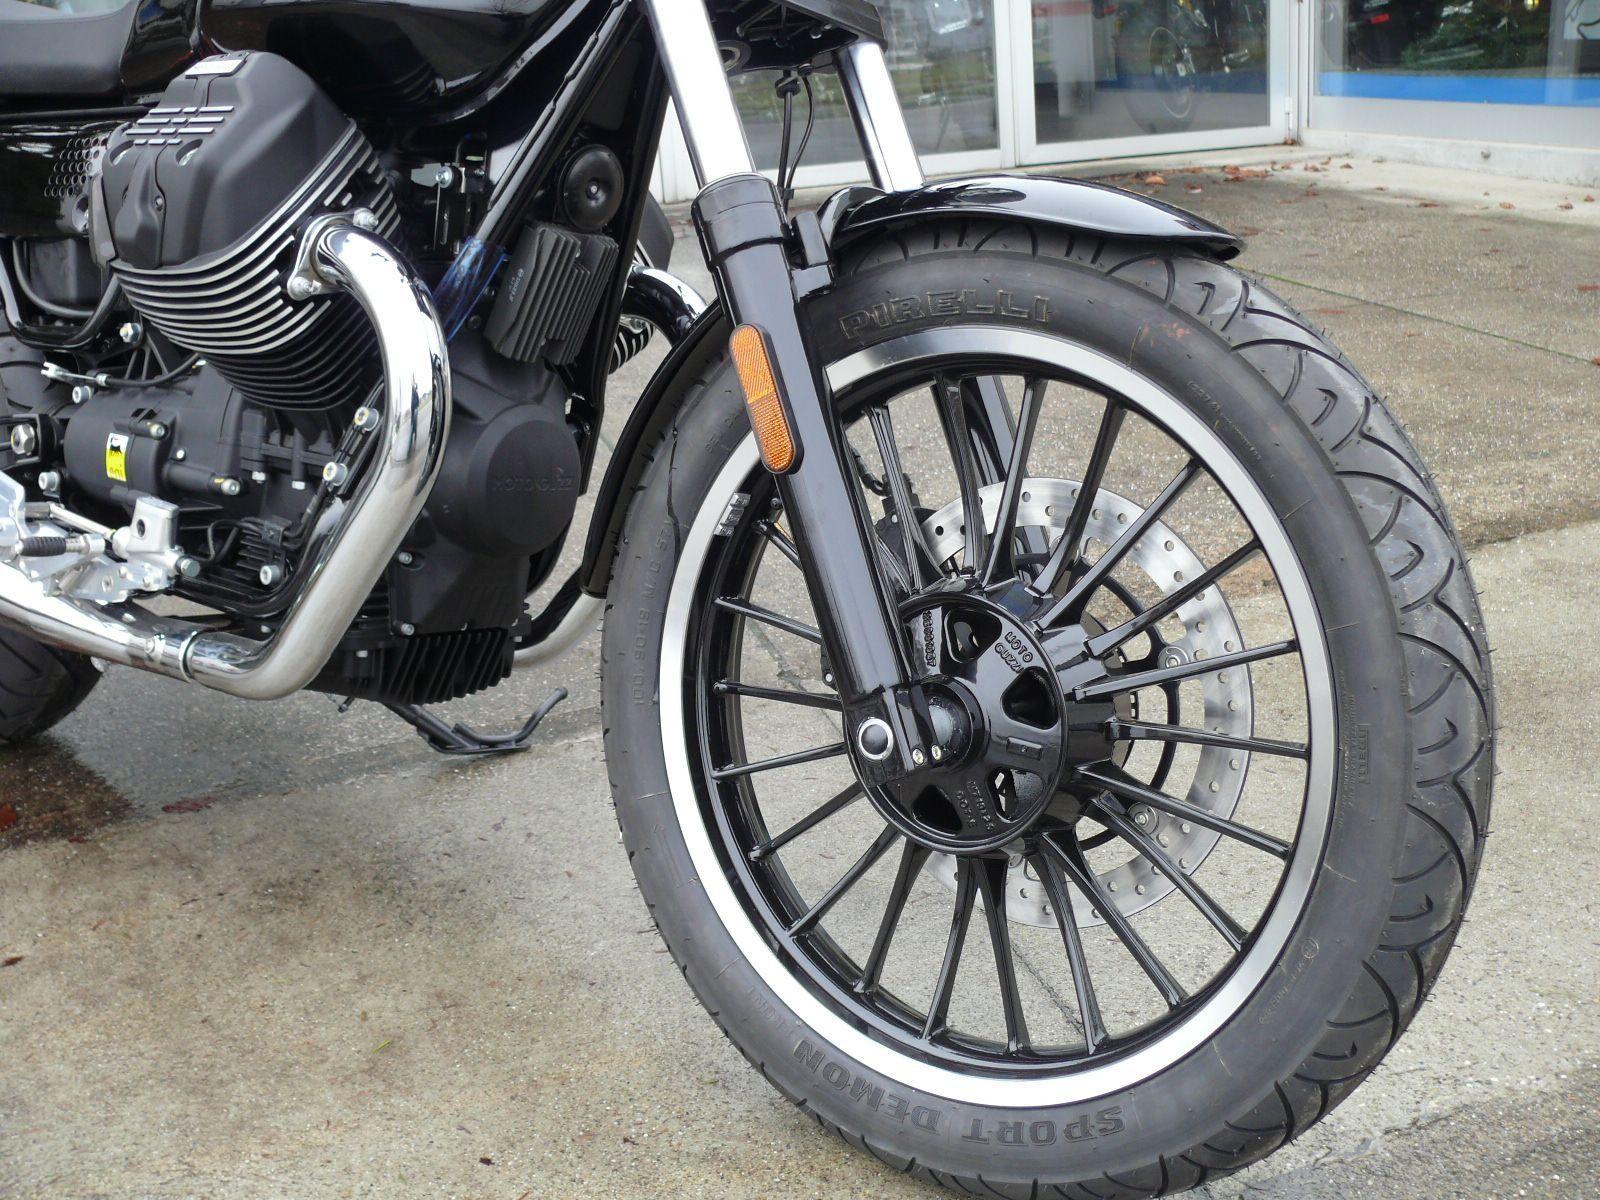 moto neuve acheter moto guzzi v9 roamer abs la strada limited edition nr 1 15 leasing. Black Bedroom Furniture Sets. Home Design Ideas